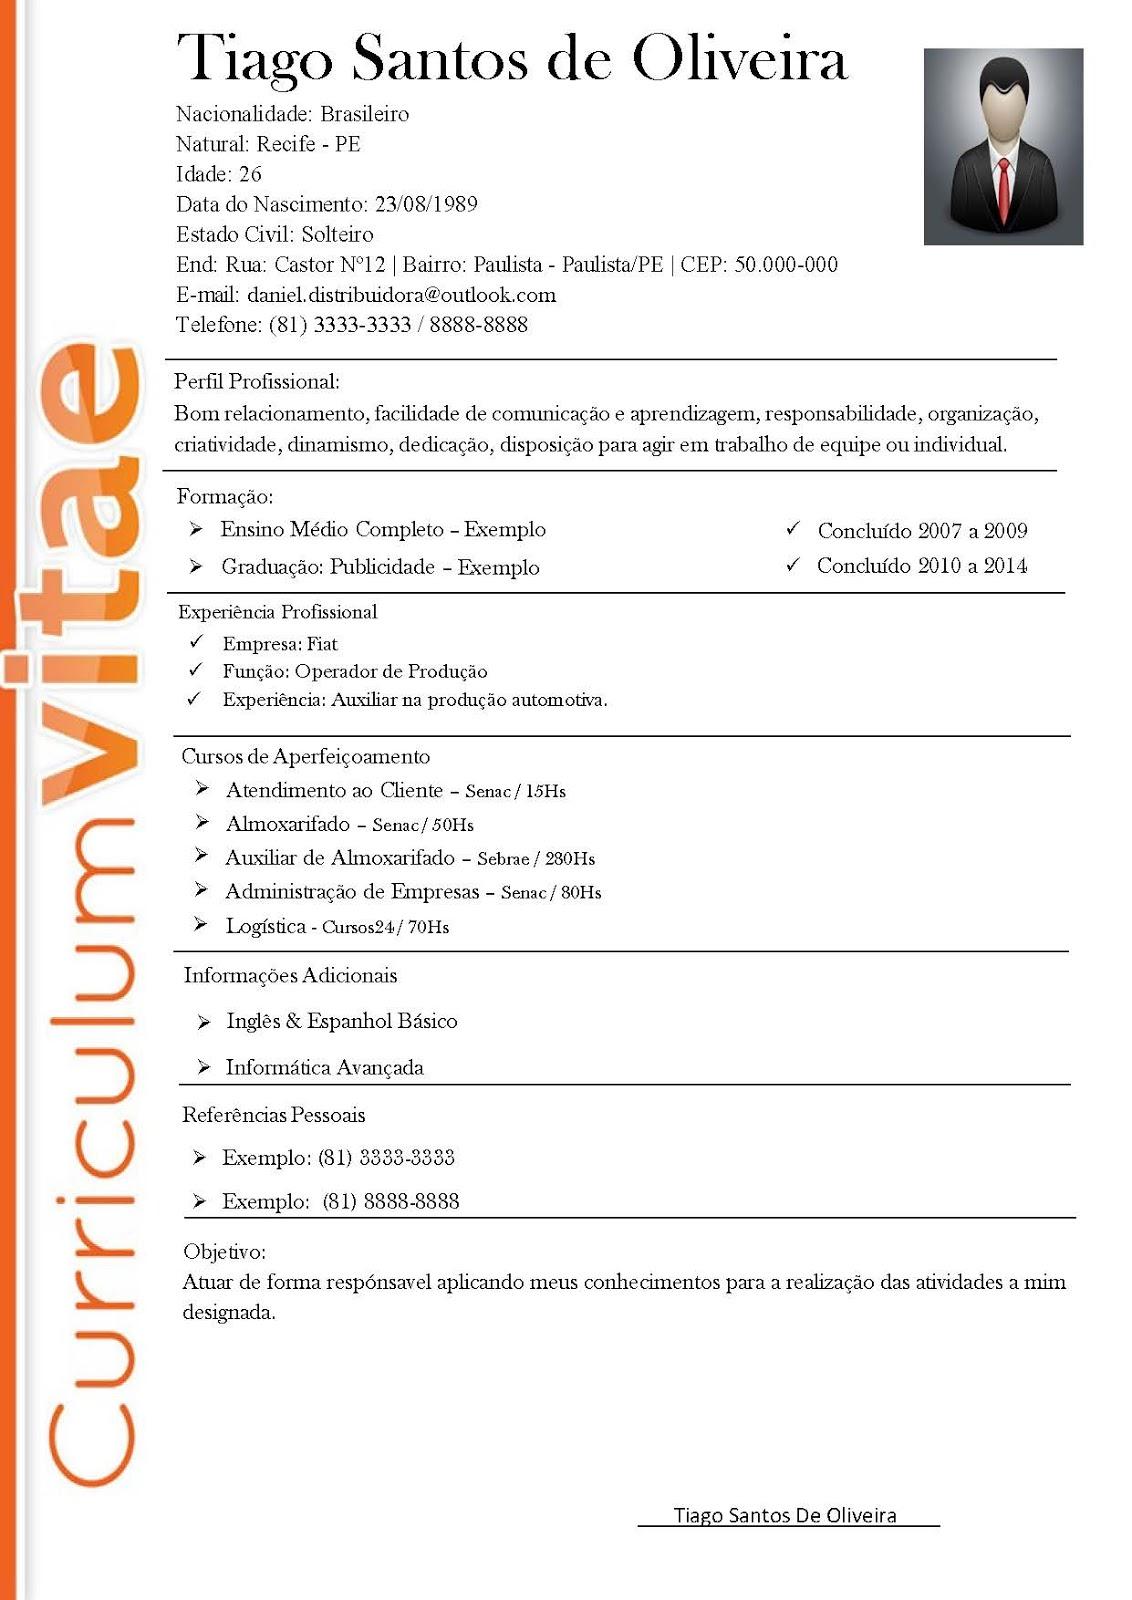 Curriculum Vitae Para Preencher Gratis Word    Stallone Pl